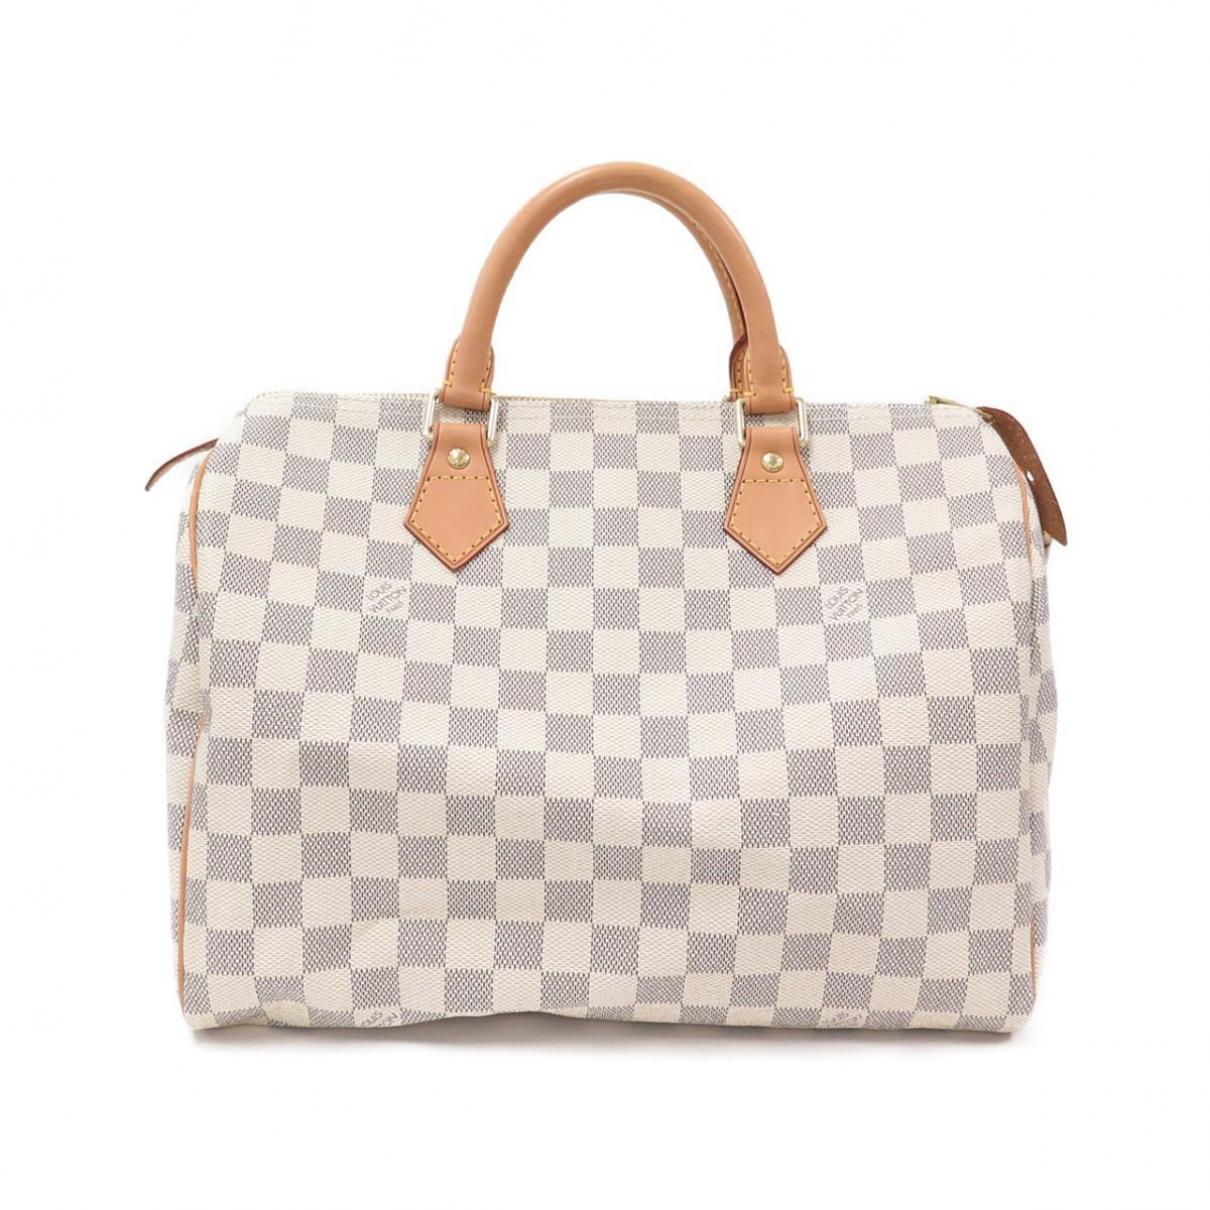 Louis Vuitton - Sac a main Speedy pour femme en toile - beige